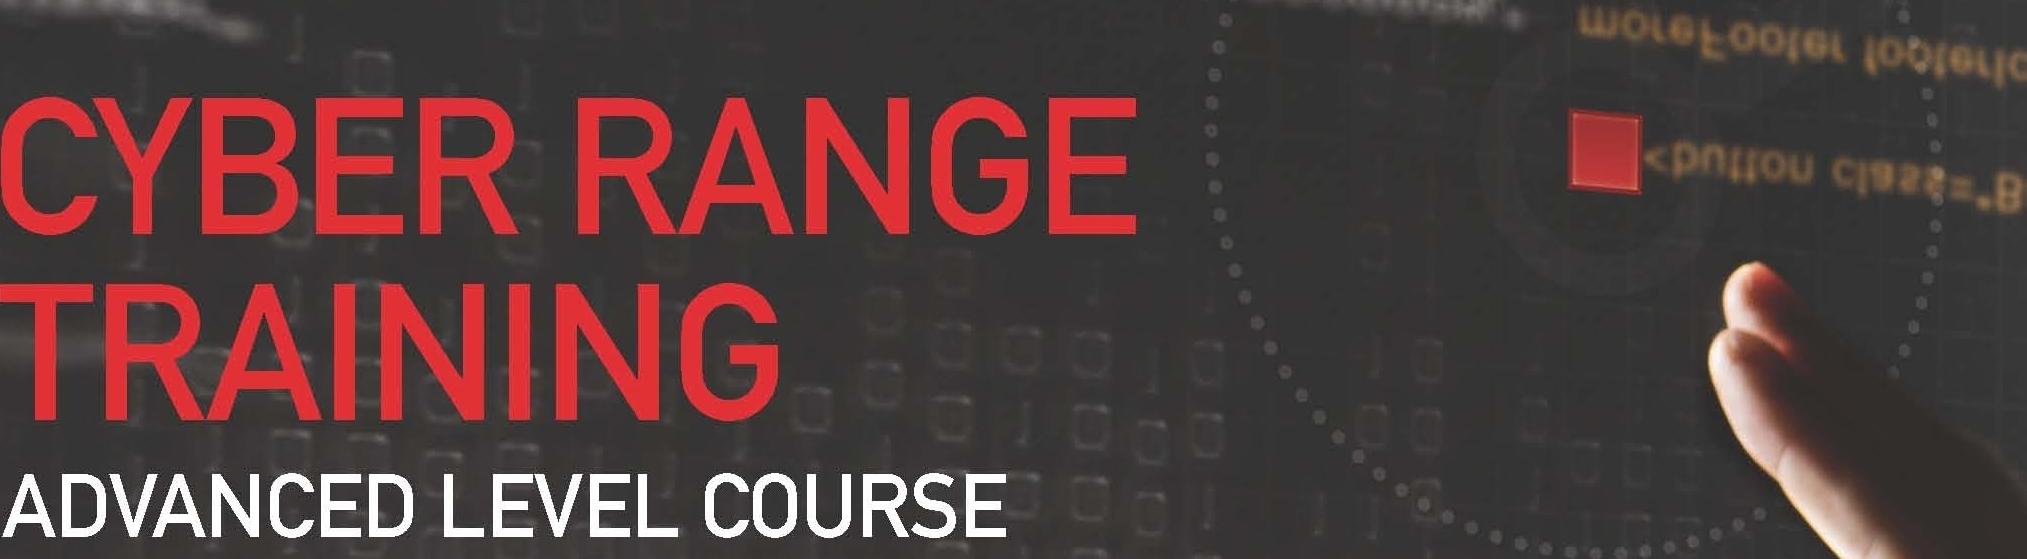 Flyer_Cyber-Range-Training-seminar-e1490147684631